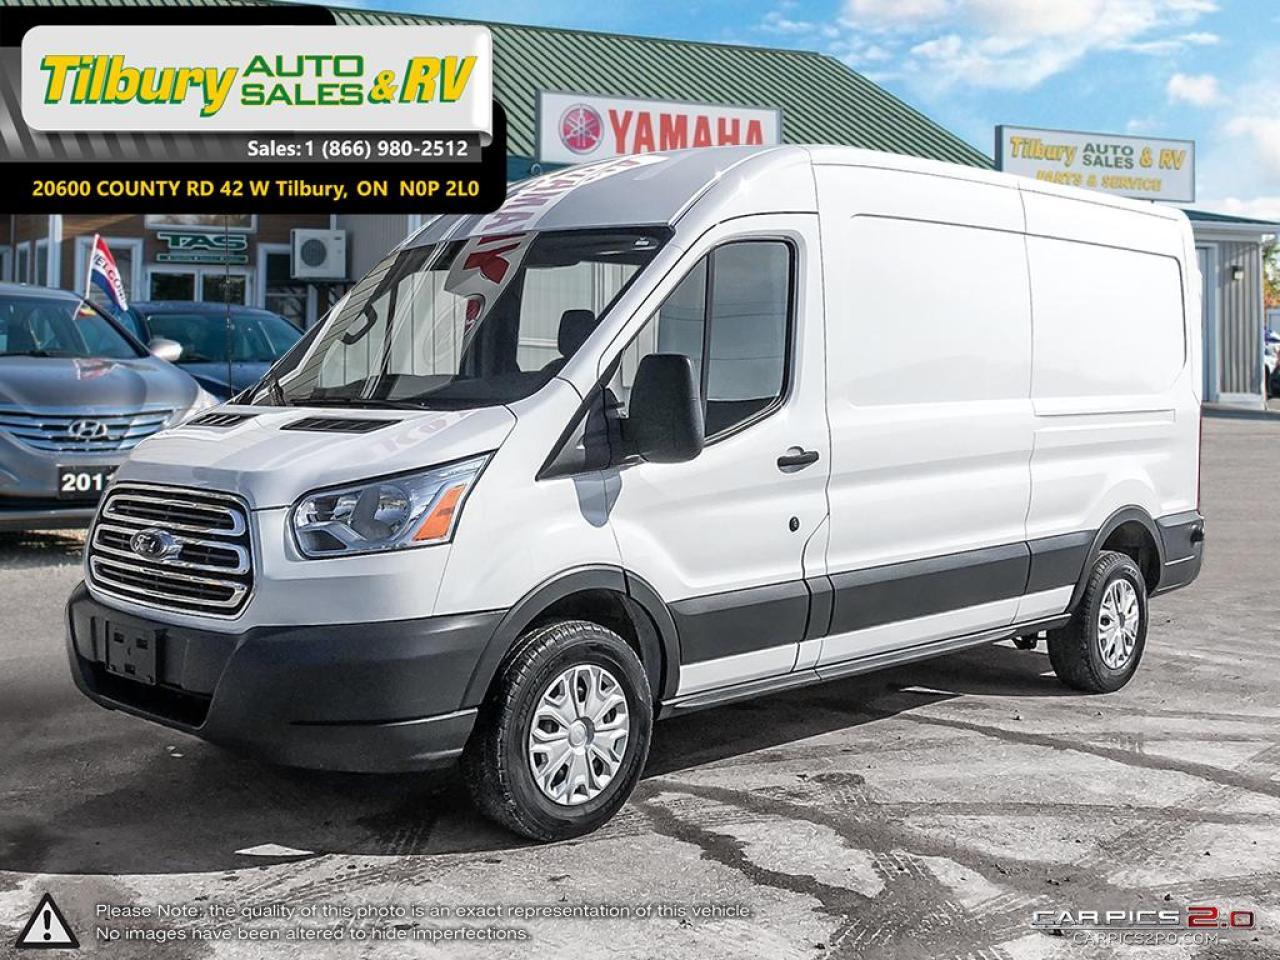 2018 Ford Transit 250 *Rearview Mirror. Quiet work van*